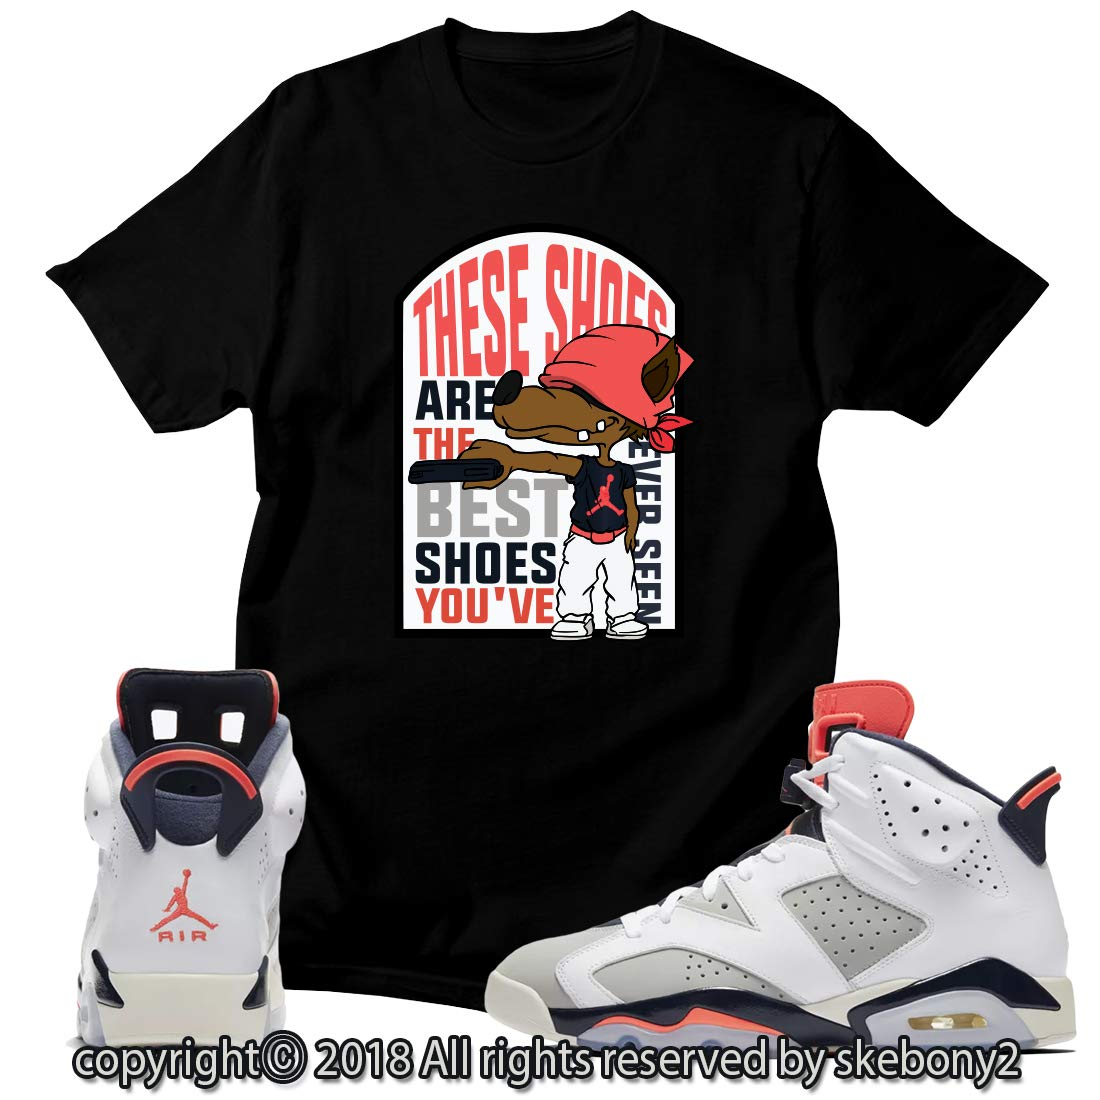 bff247d03c7669 Amazon.com  Custom T Shirt Matching Style of AIR Jordan 6 Infrared Tinker  JD 6-10-22  Clothing